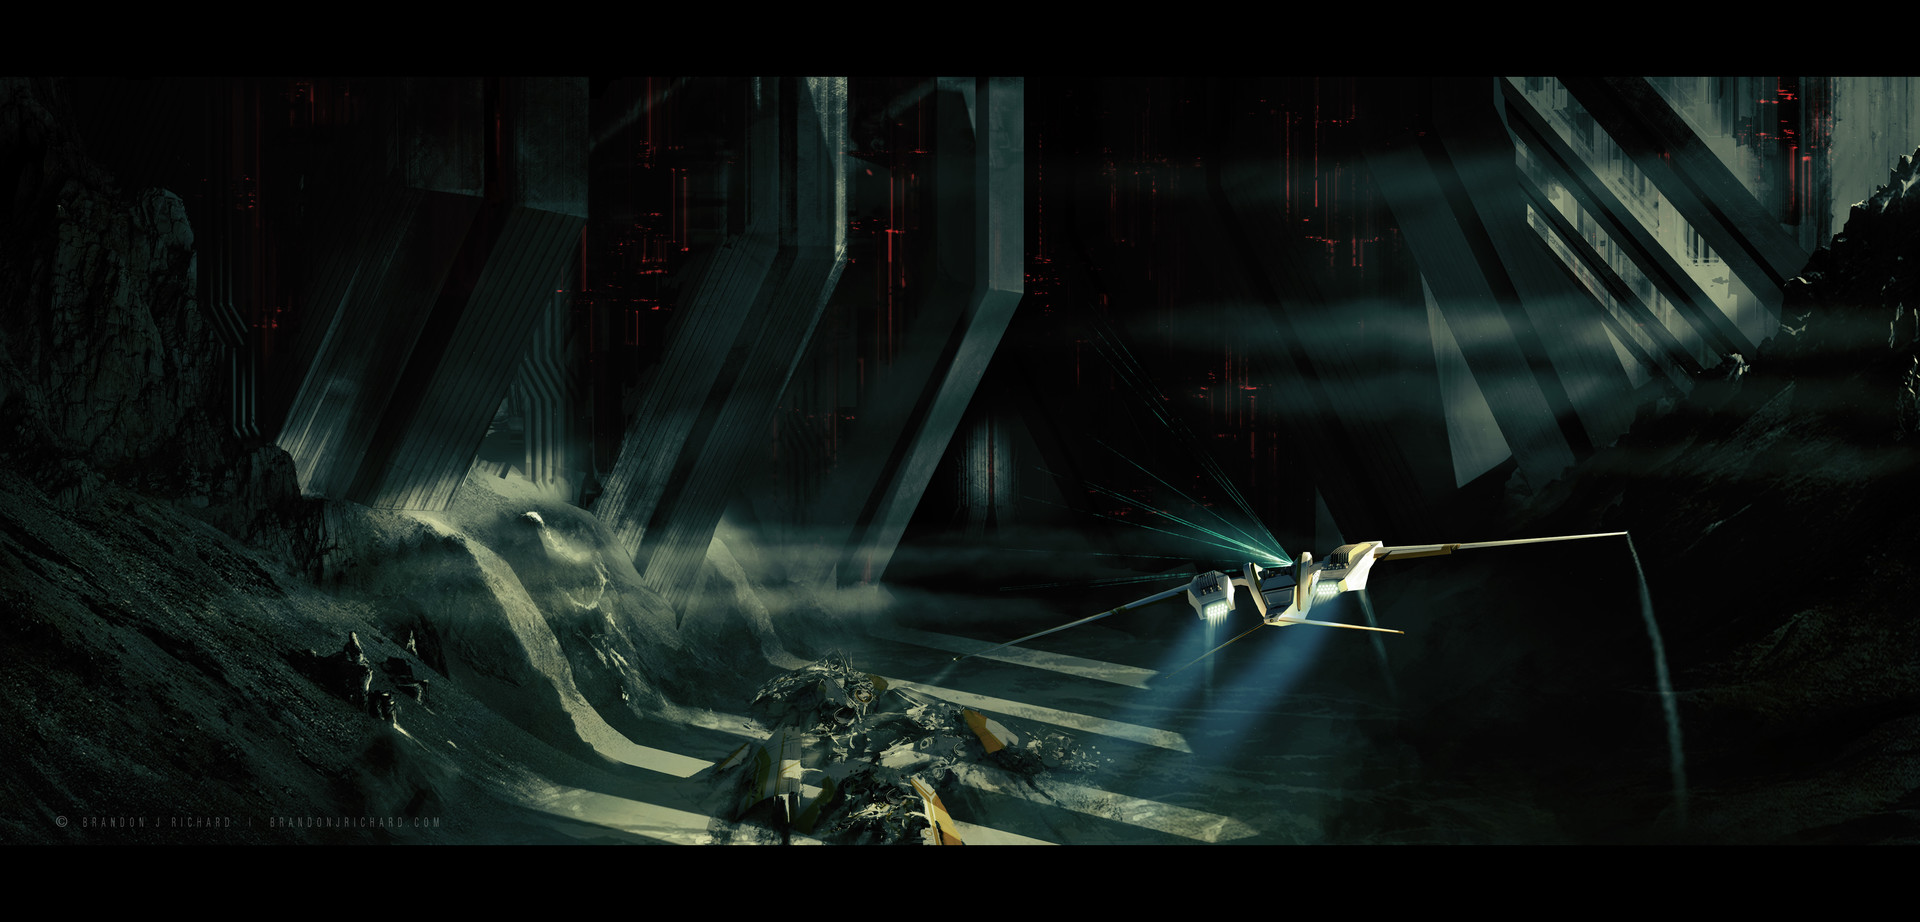 Brandon richard sparrow scene into the unknown 06 final